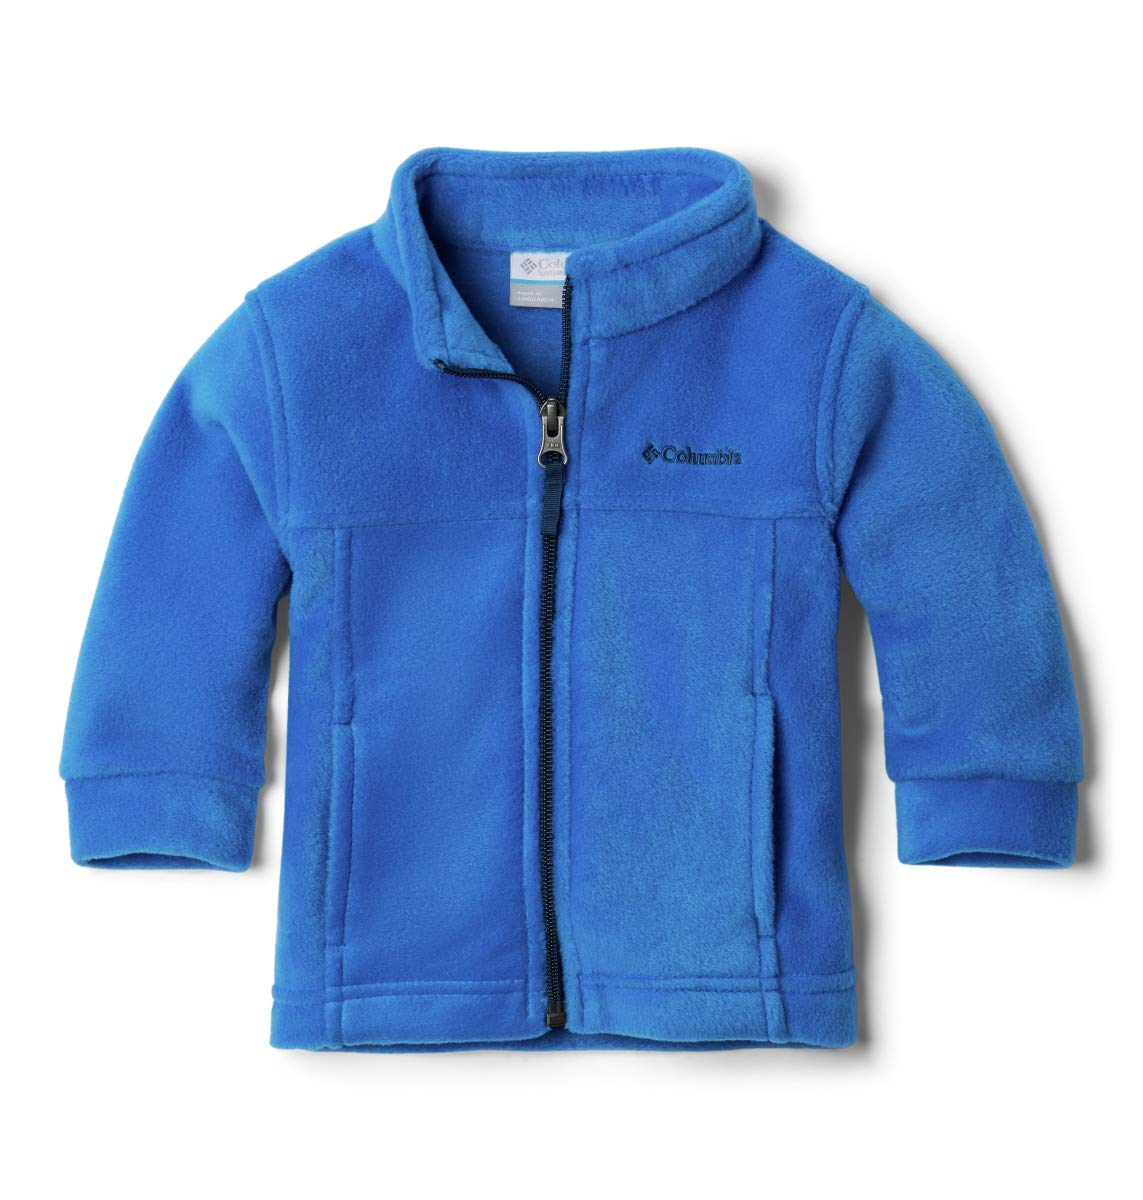 Columbia Boys Steens Mt Ii Jacket Soft Fleece with Classic Fit